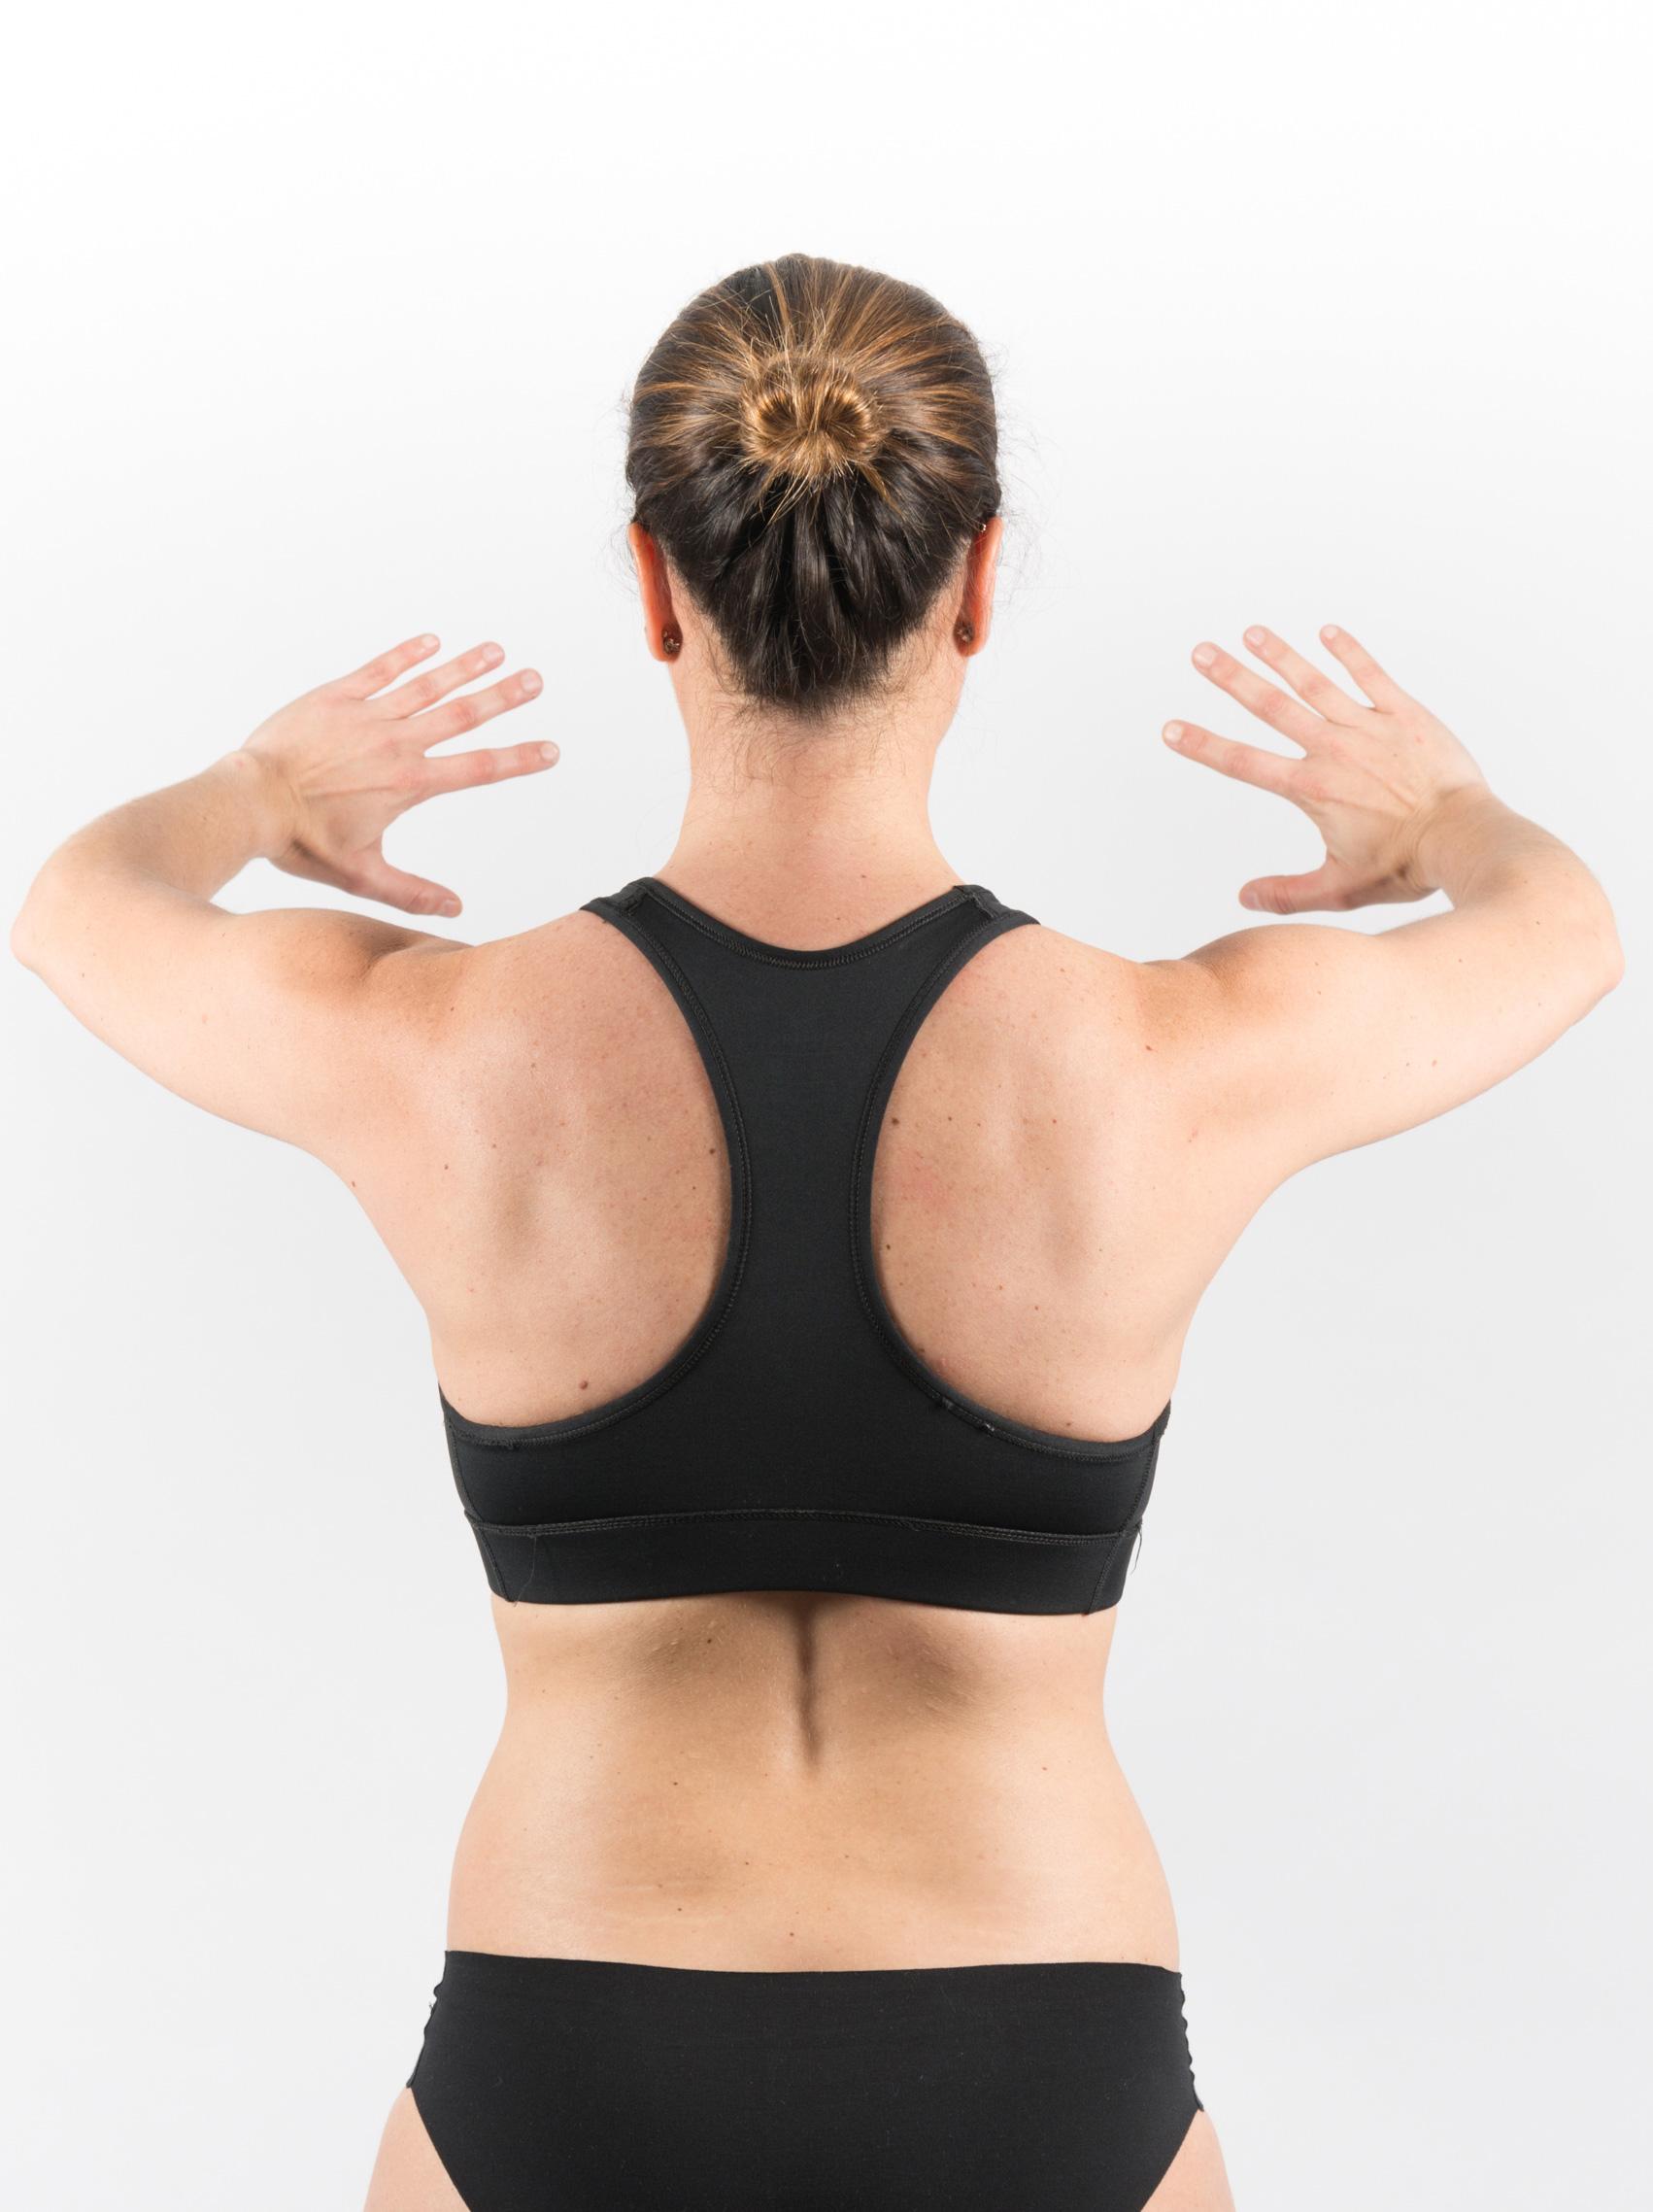 Omóplatos, fisioterapia deportiva